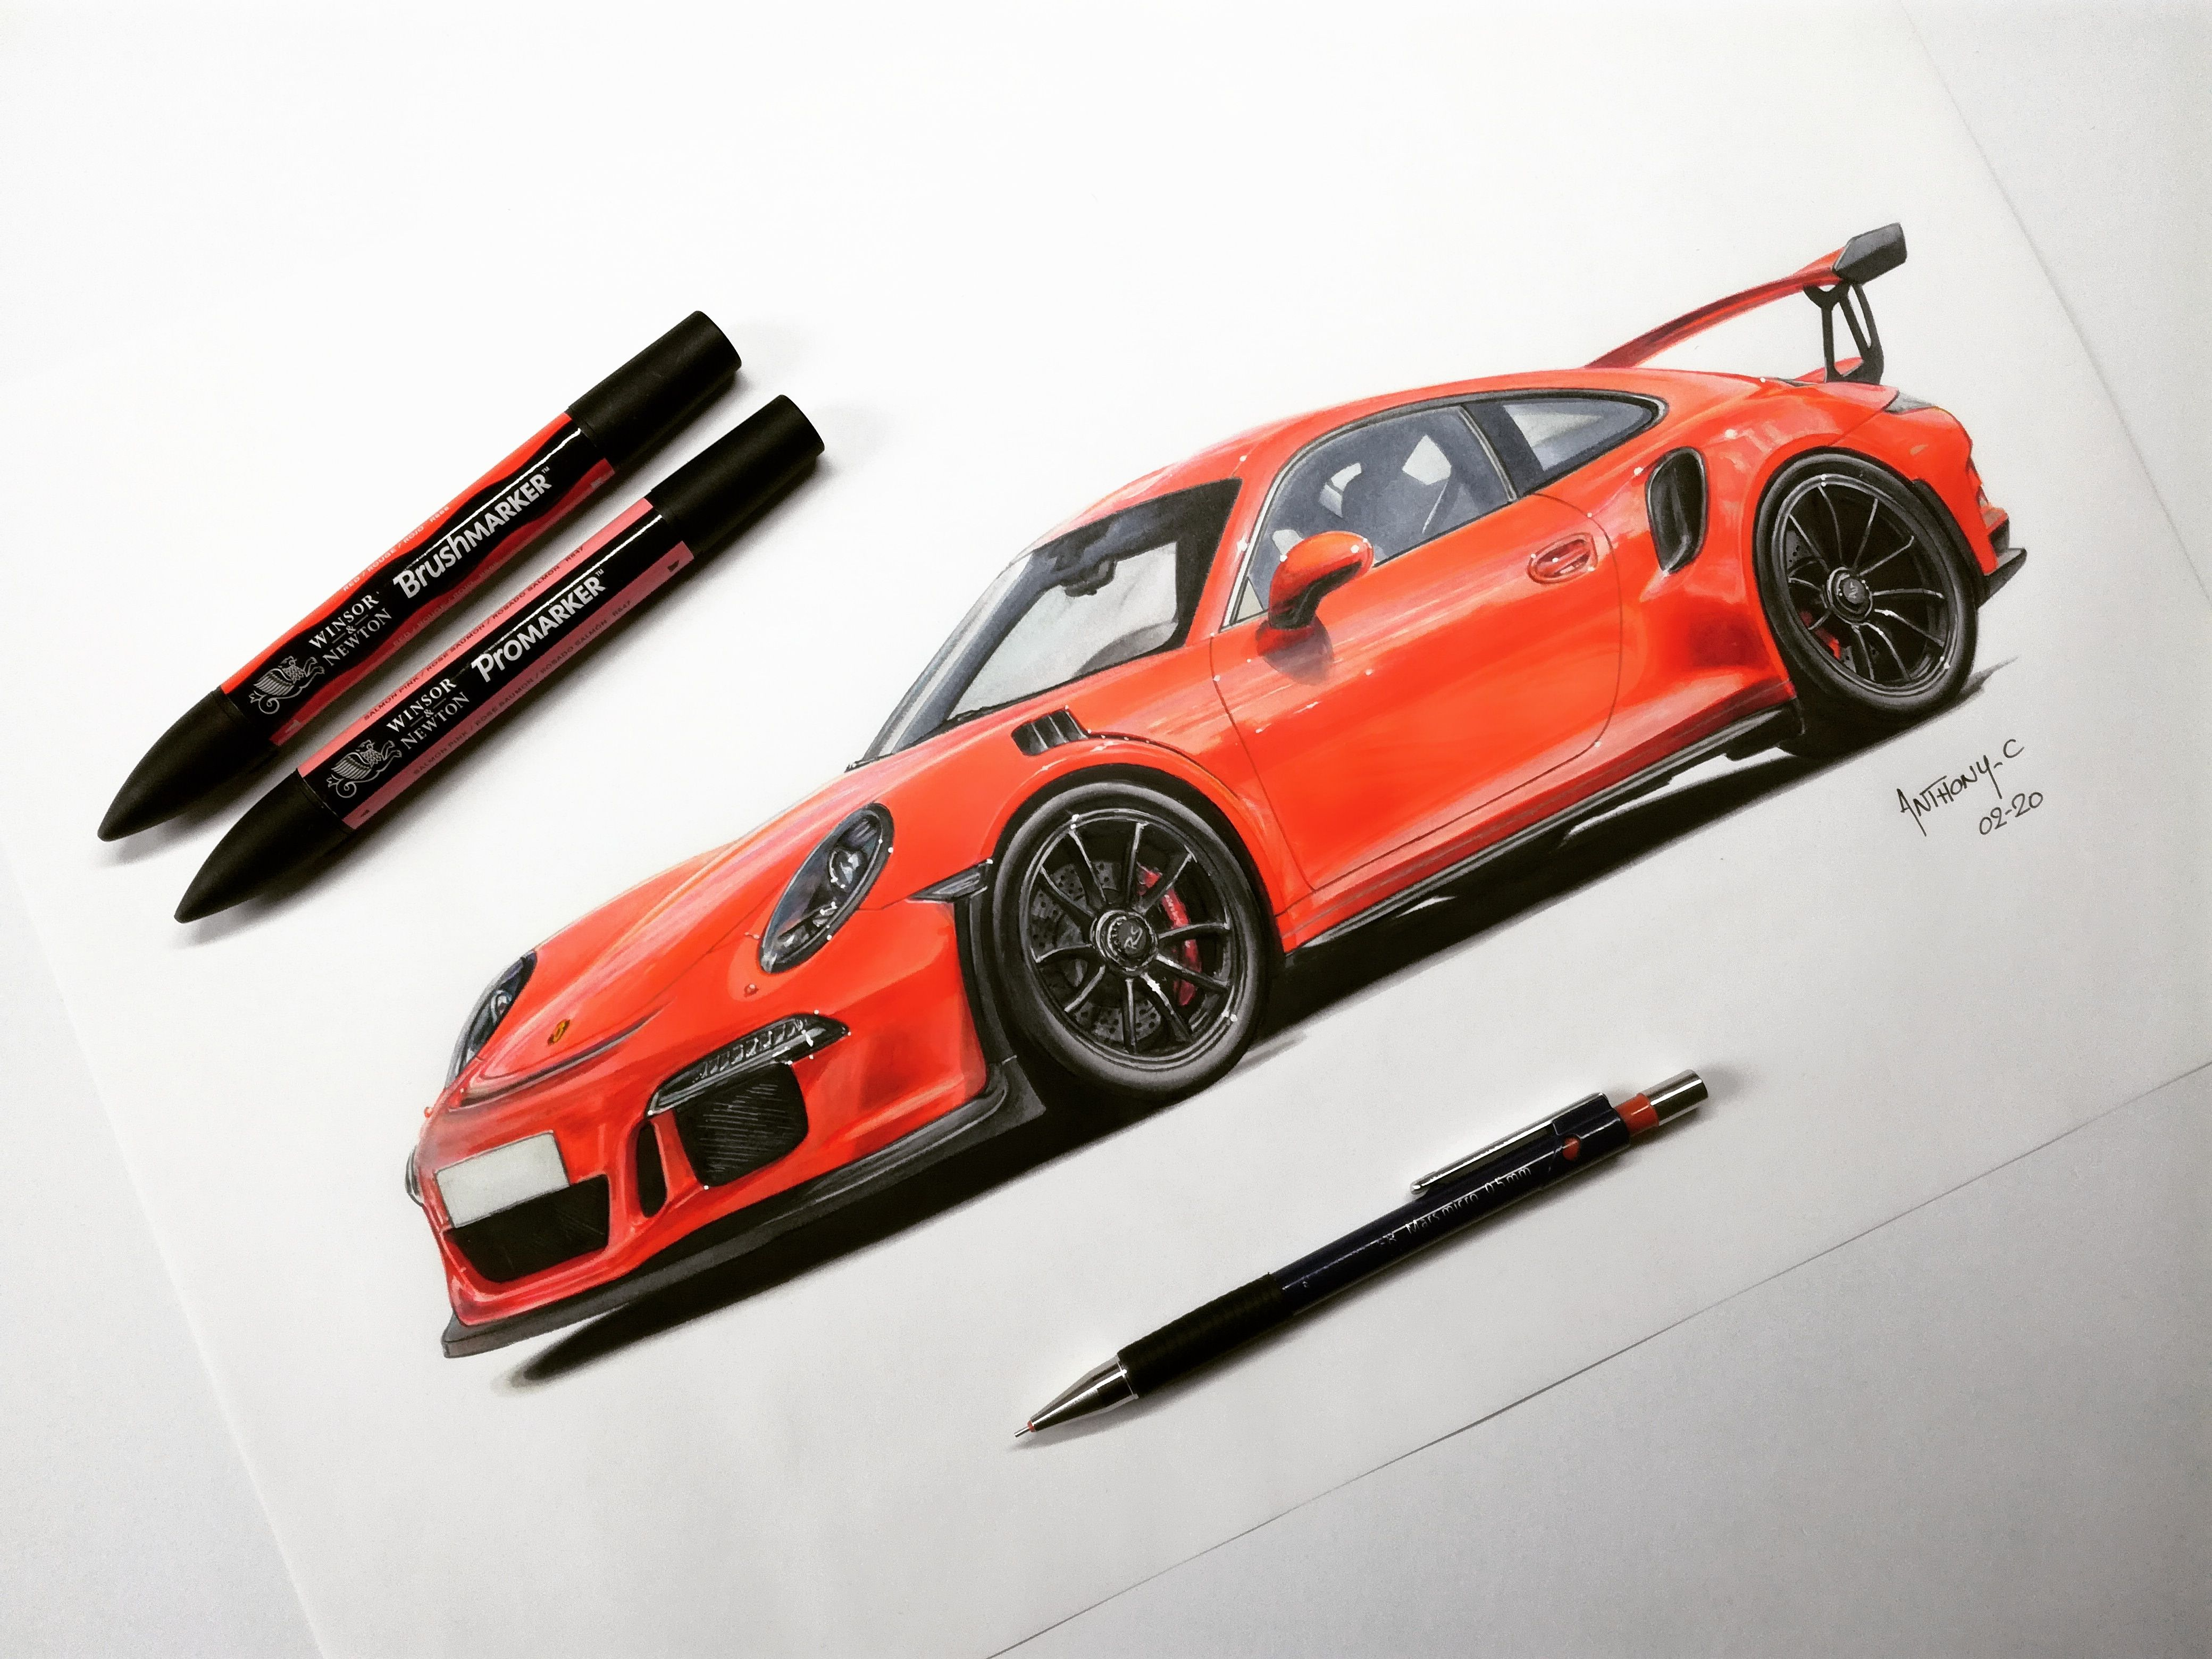 Pin By Castel On Racine Art Car Porsche Lexus Cars